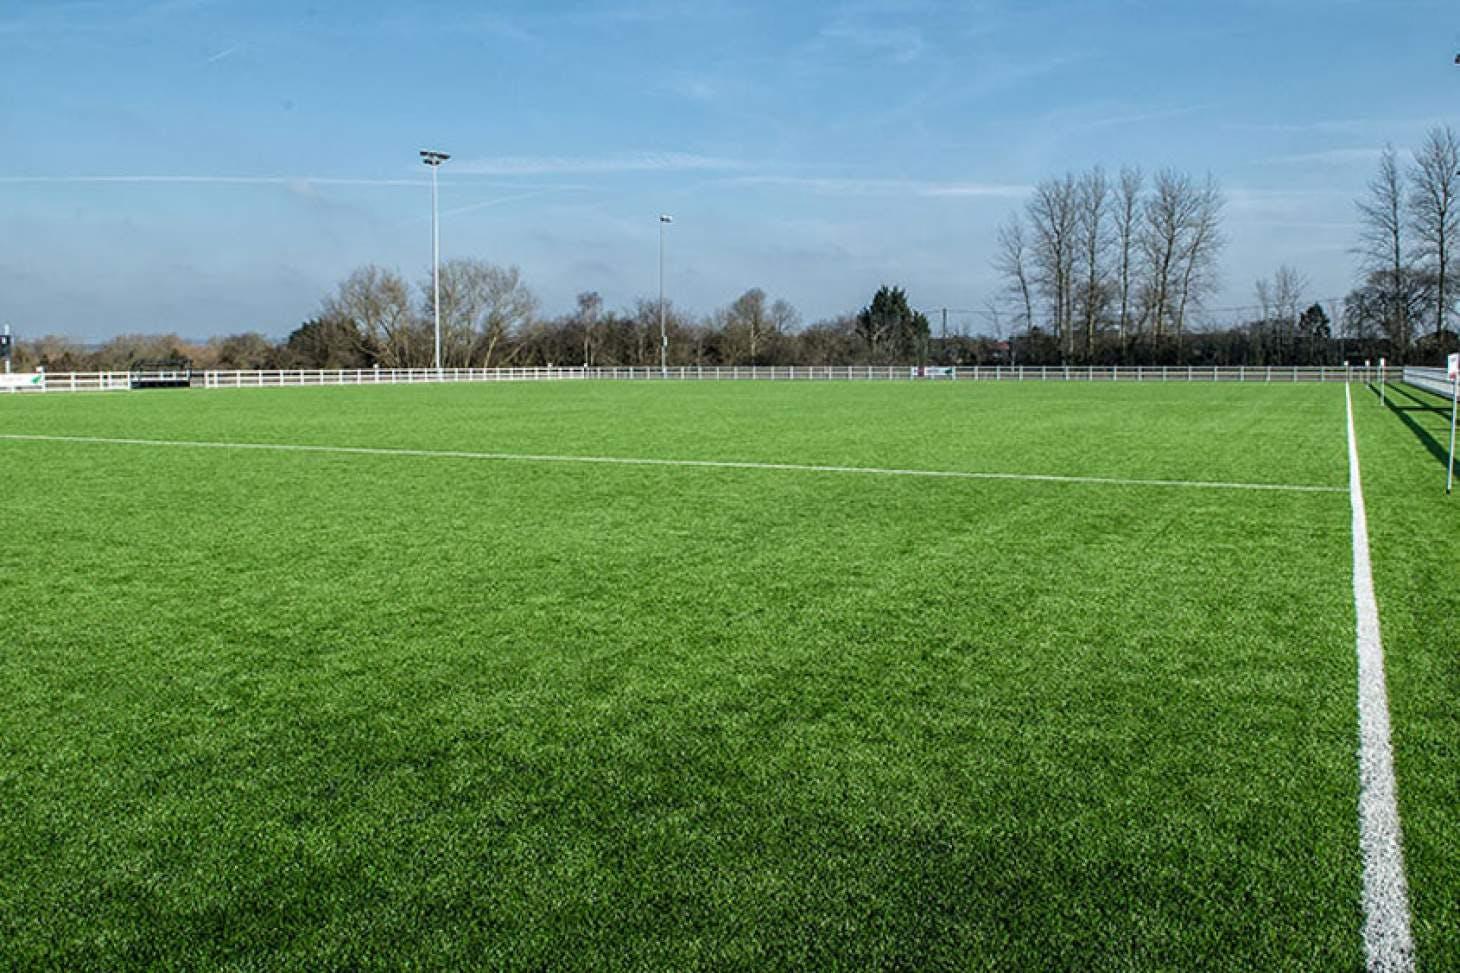 PlayFootball Walsall 8 a side | 3G Astroturf football pitch